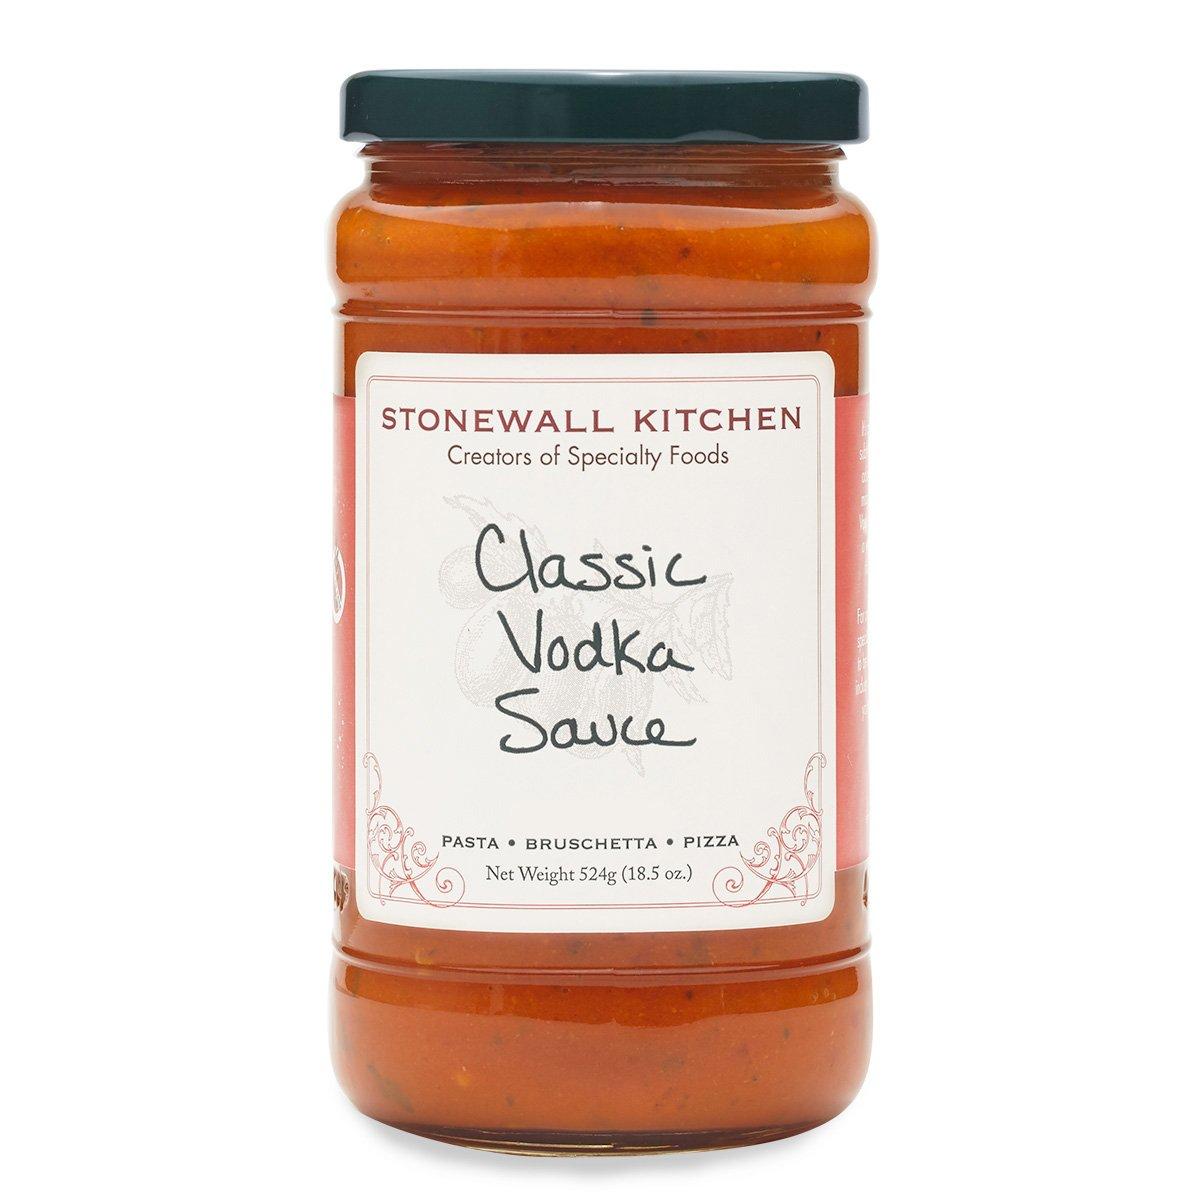 Stonewall Kitchen Classic 18.5oz Sauce Max 65% OFF Popular products Vodka